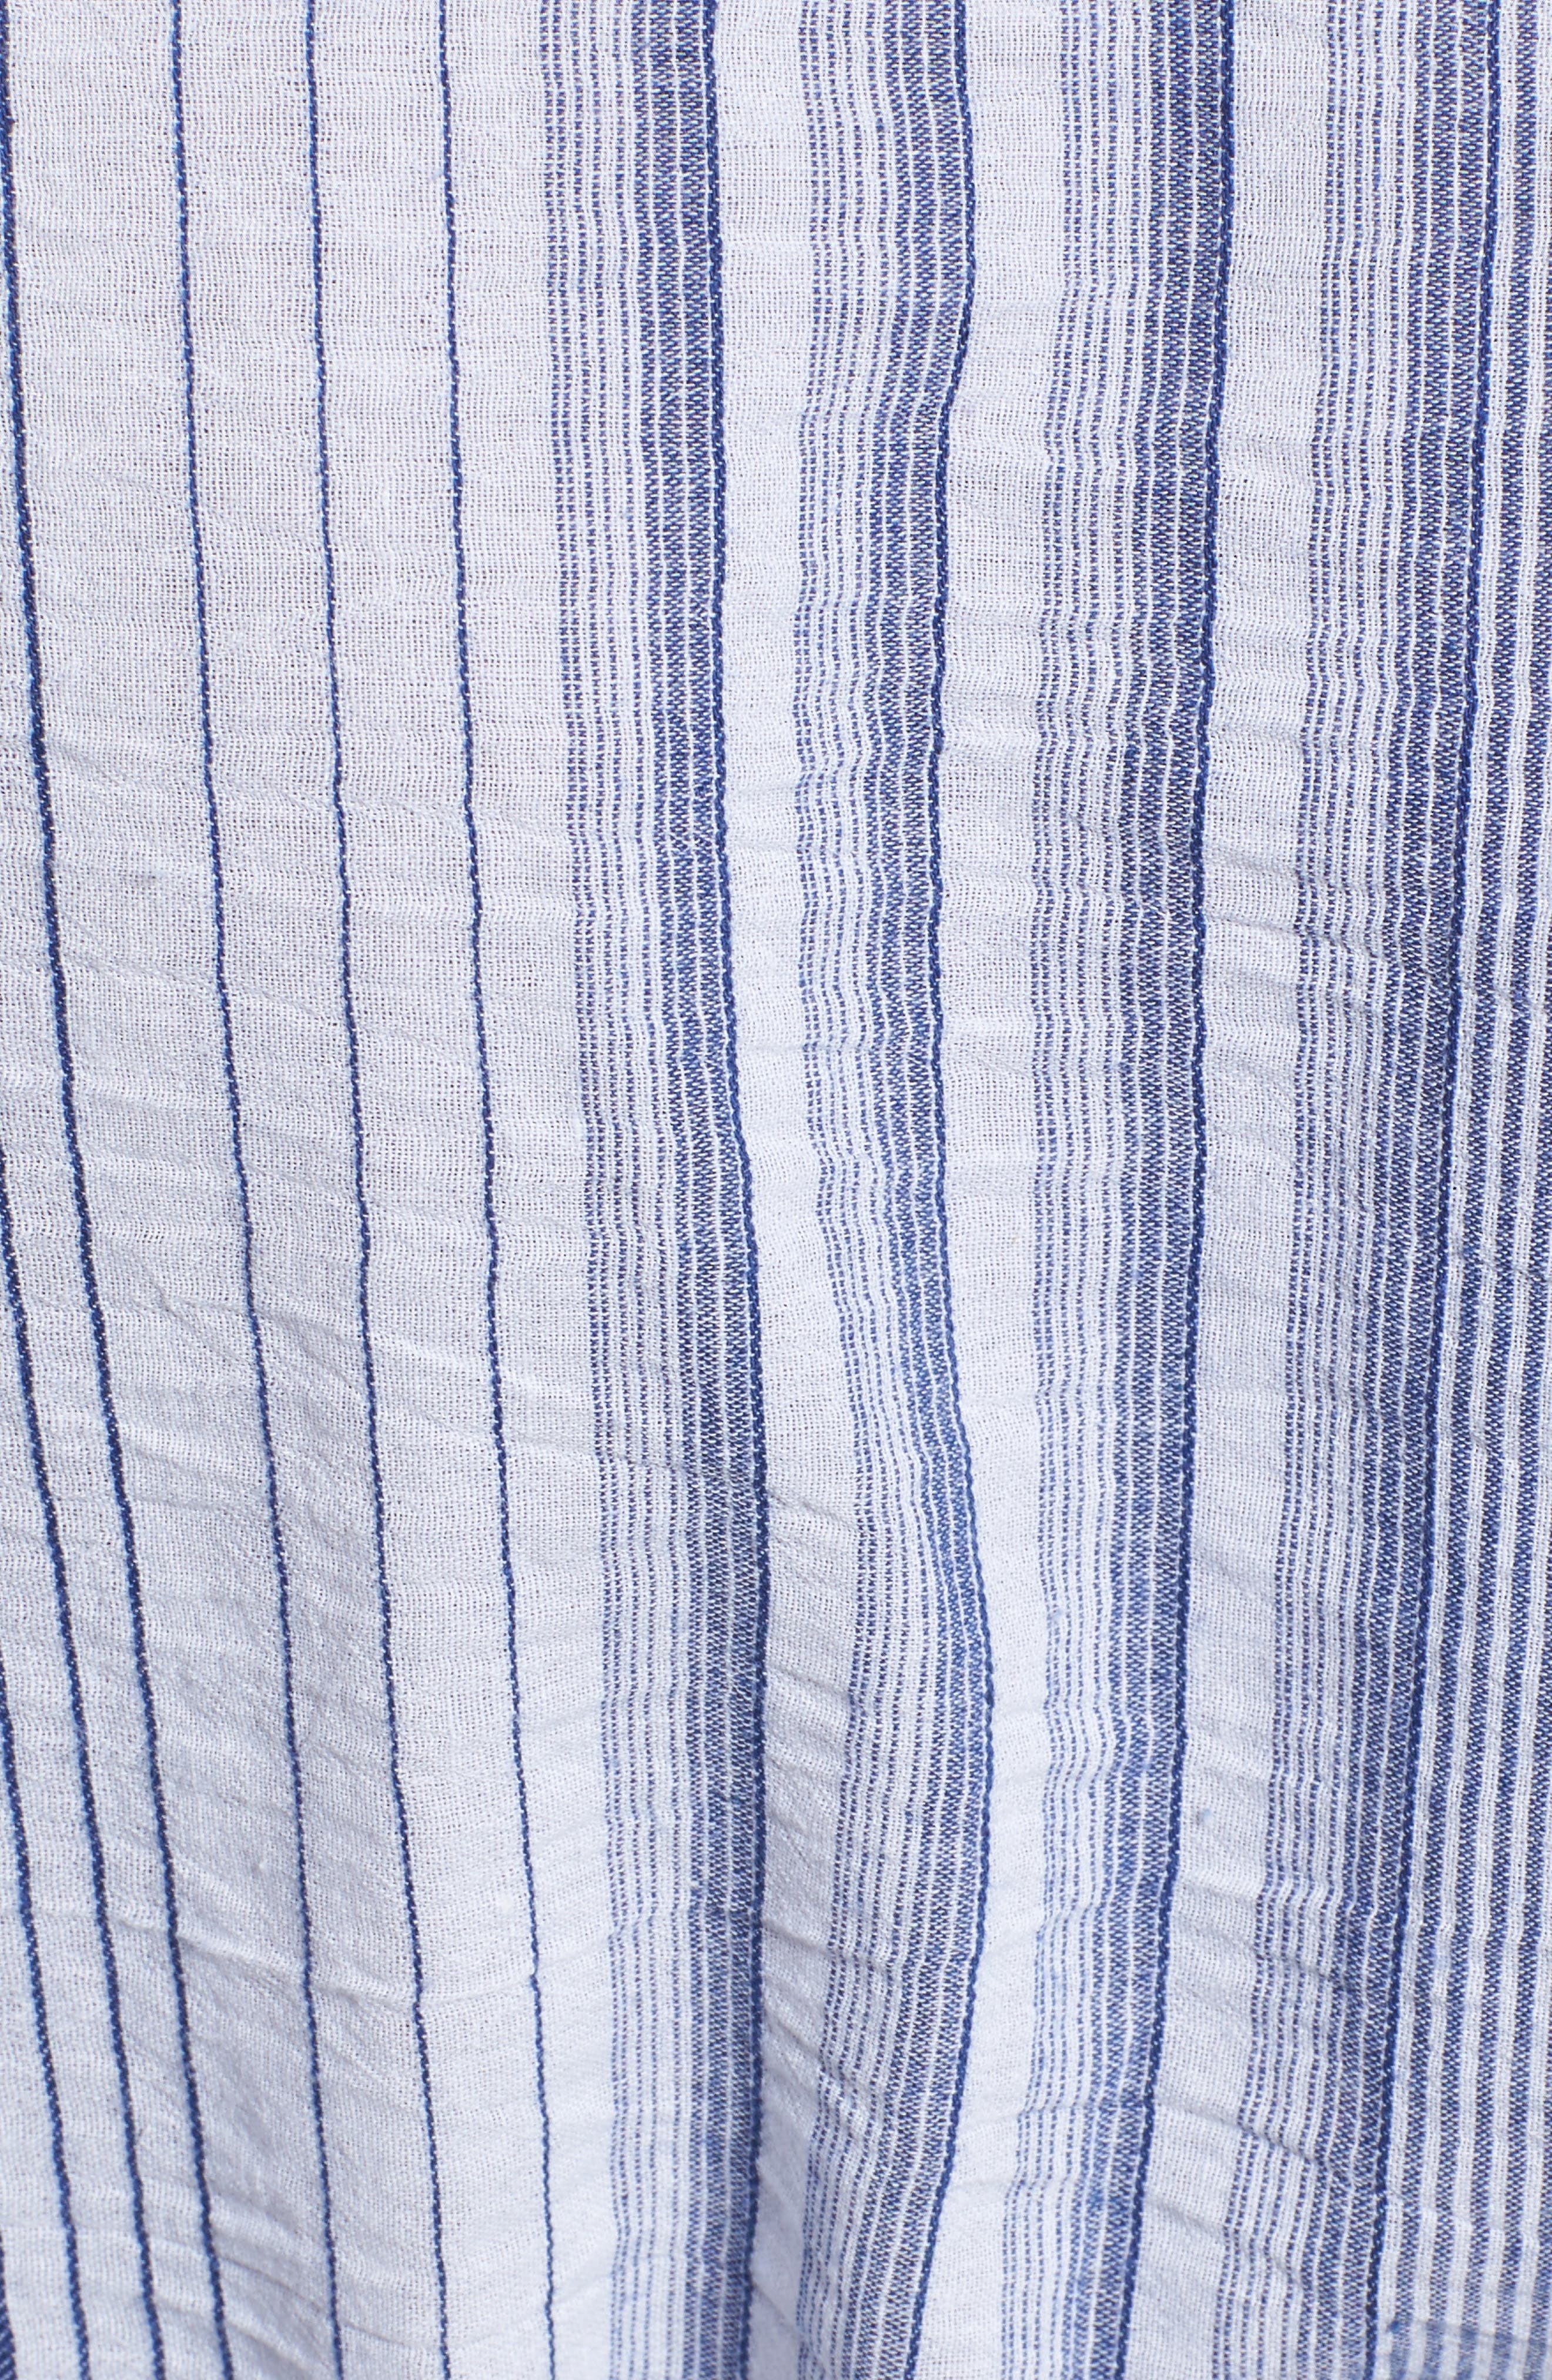 Tier Sleeve Wrap Top,                             Alternate thumbnail 5, color,                             406